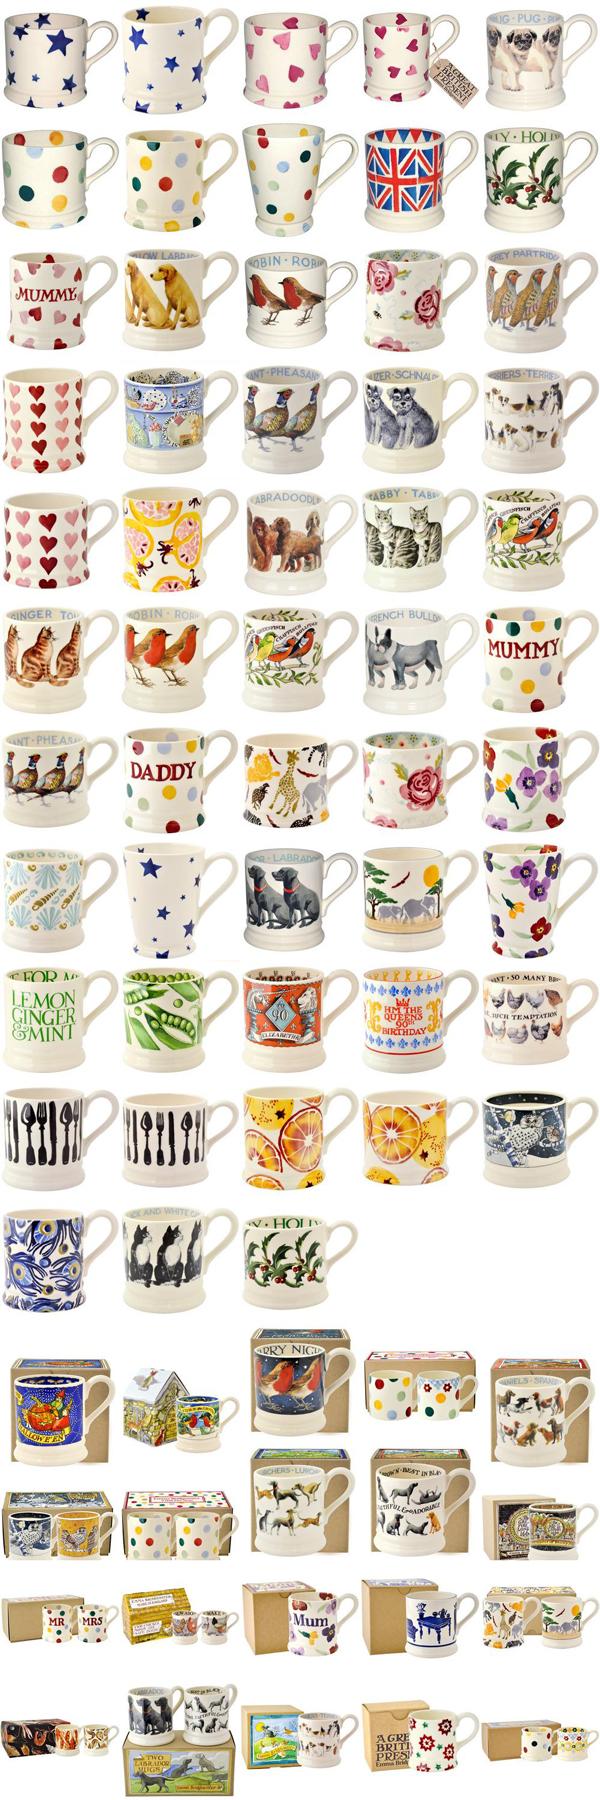 emma-bridgewater-mugs-3